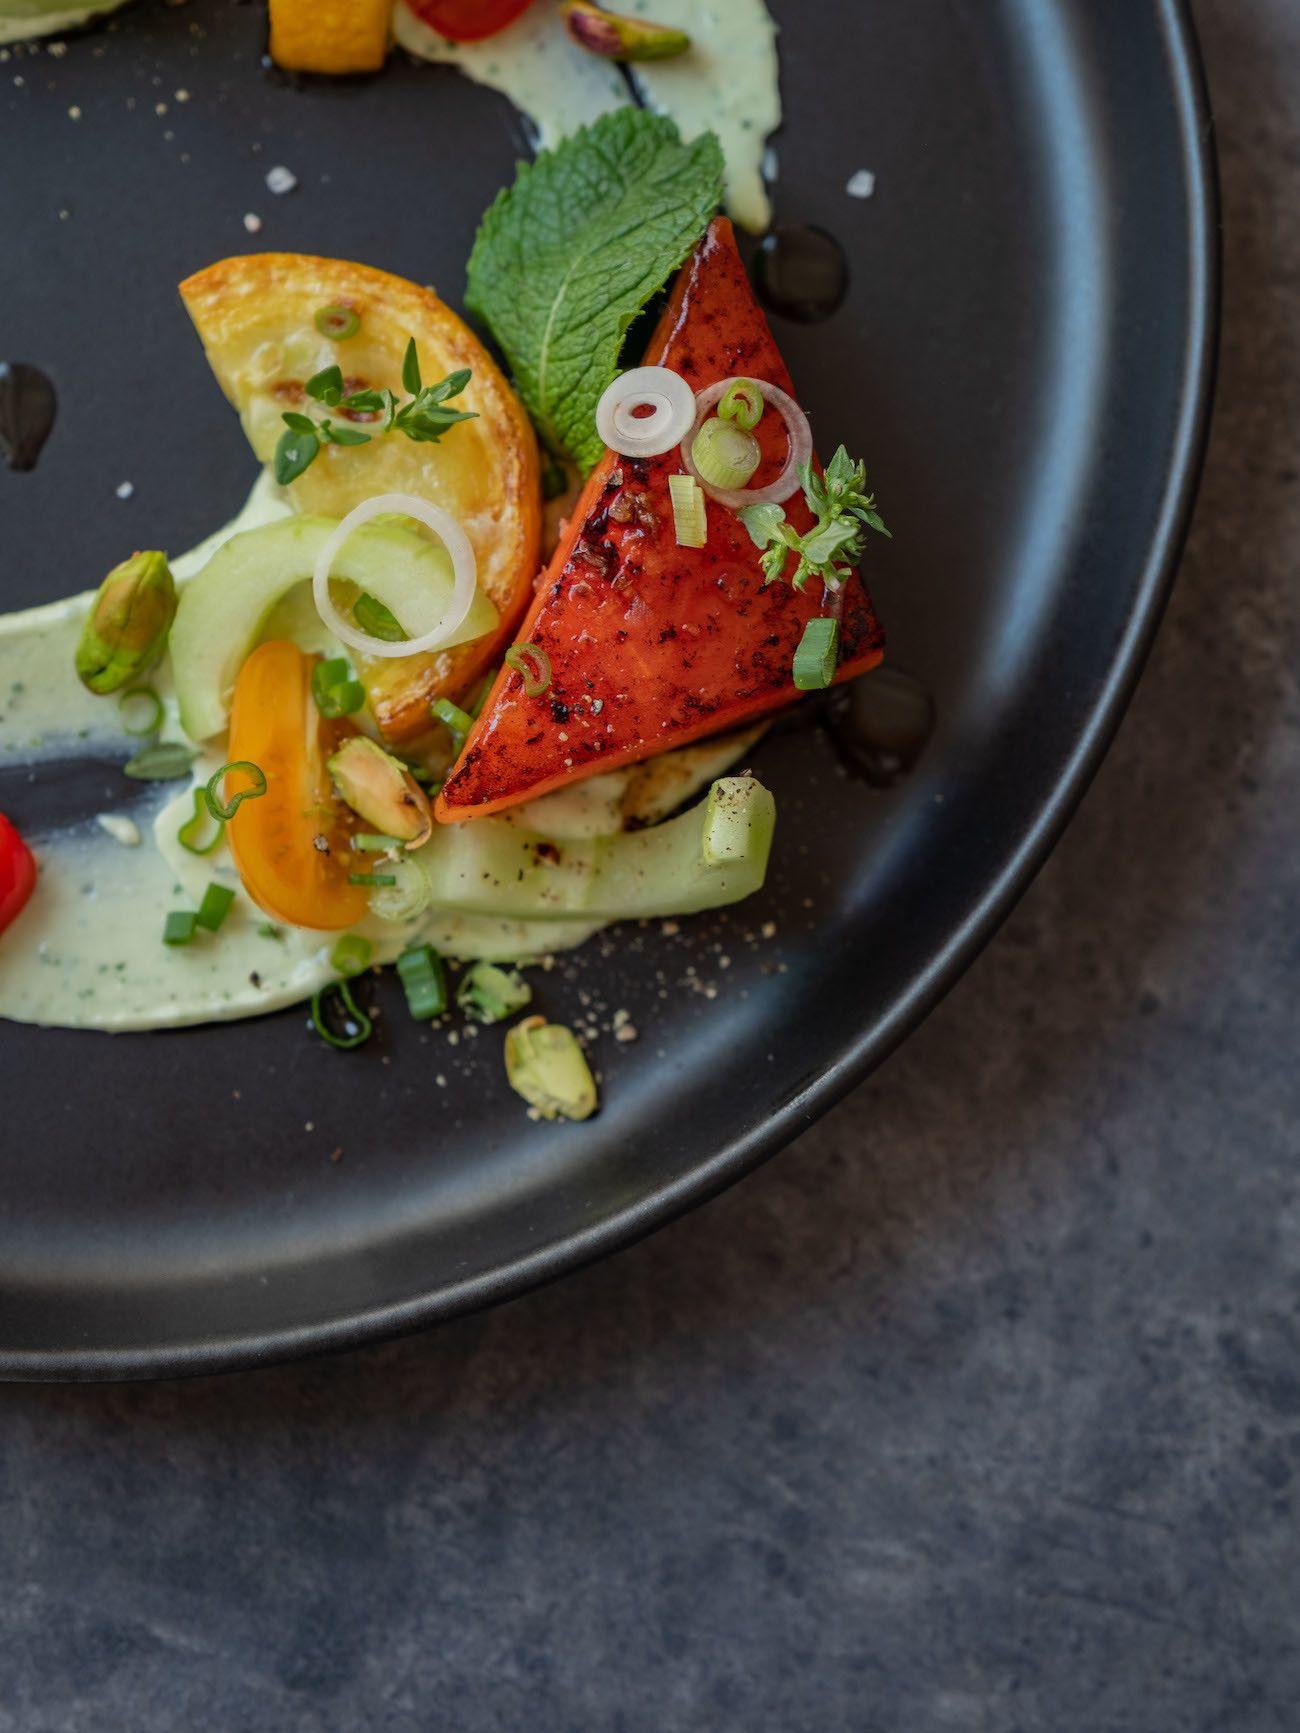 Foodblog, About Fuel, Rezept, Wassermelonensalat auf Basilikum-Feta-Creme, Thymian, Frühlingszwiebeln, Zucchini, Minze, Tomaten